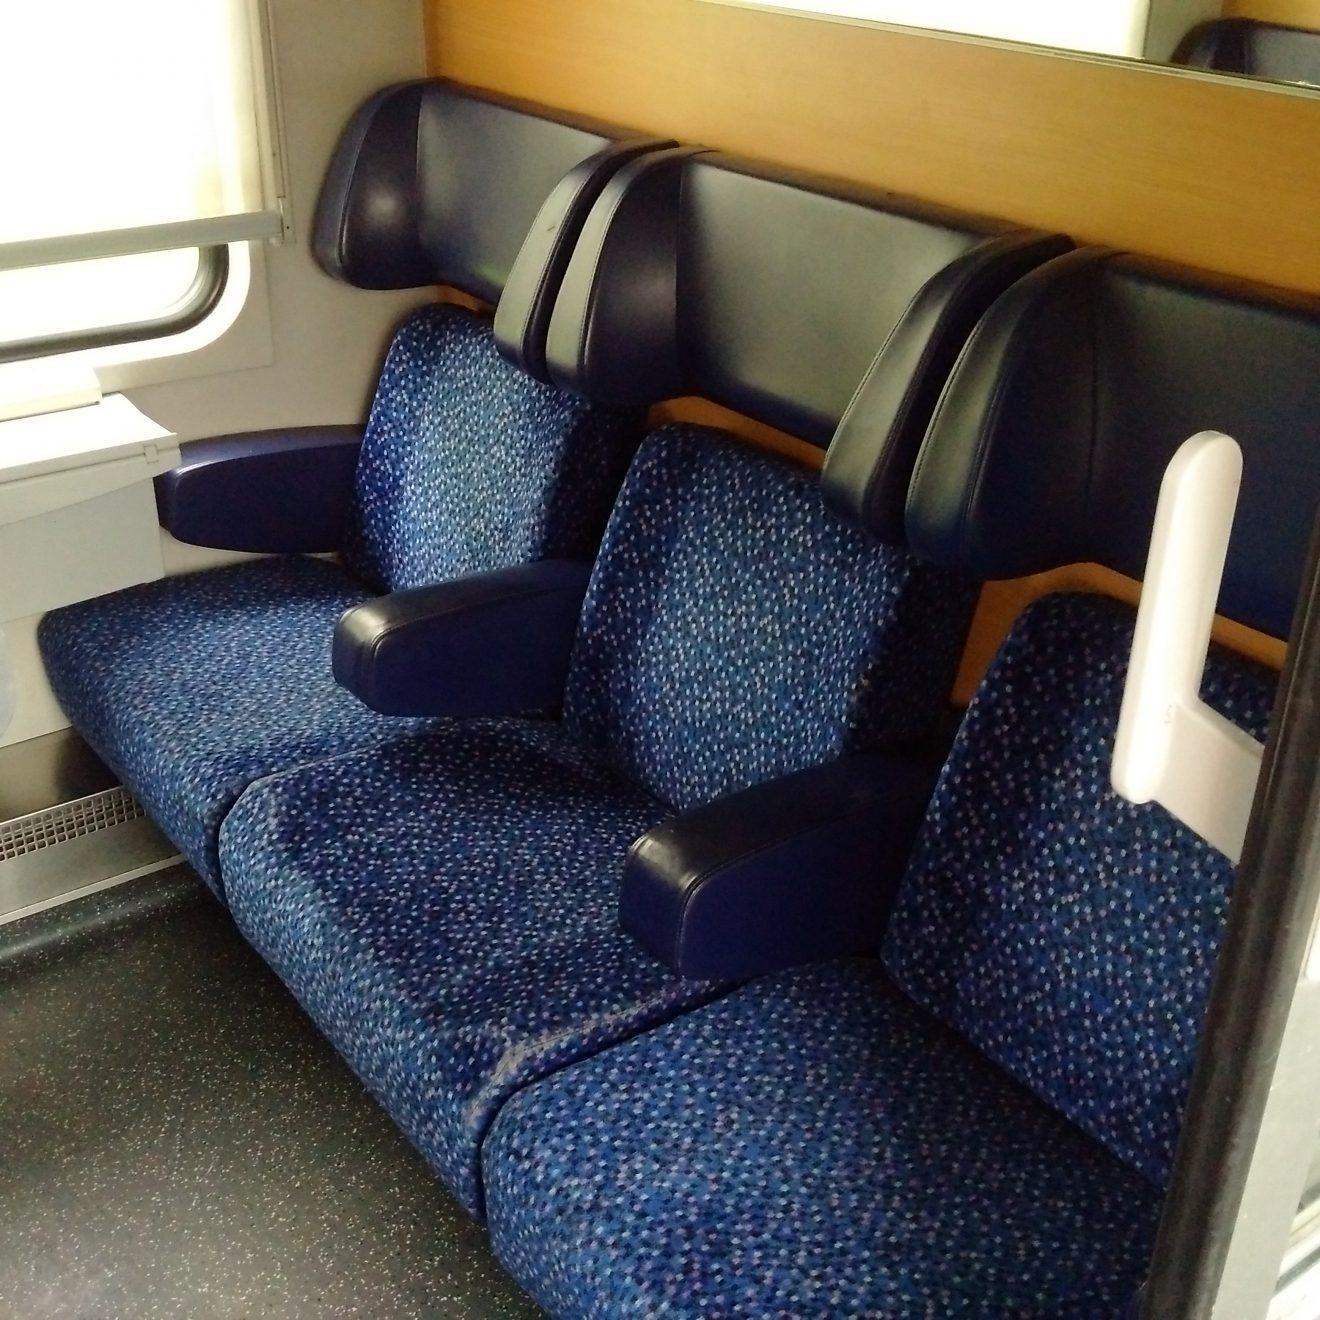 Seated Car on European Night Train